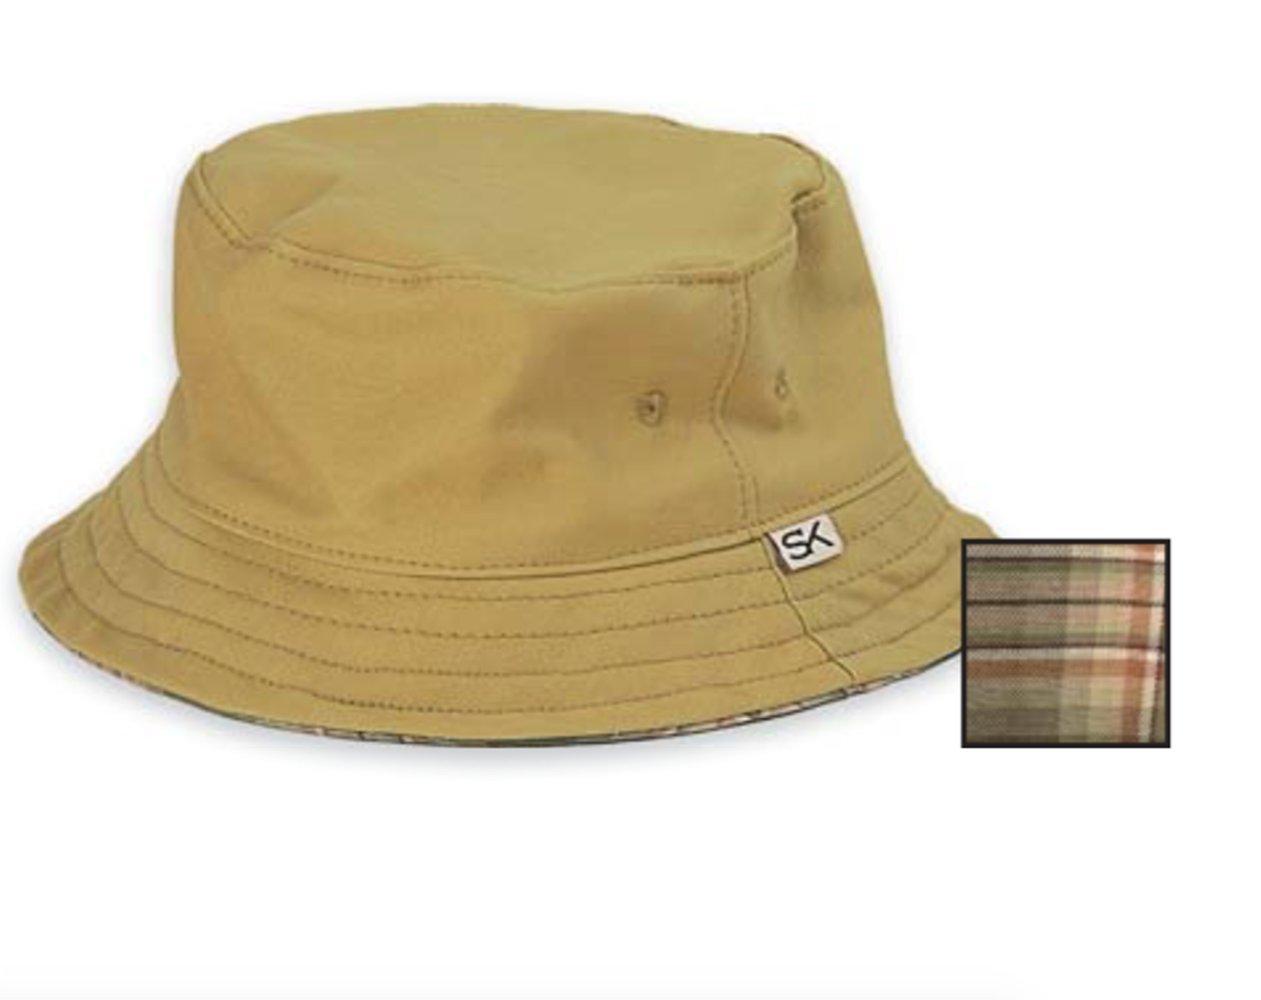 Stormy Kromer Unisex Bucket Hat, Khaki, L by Stormy Kromer (Image #1)